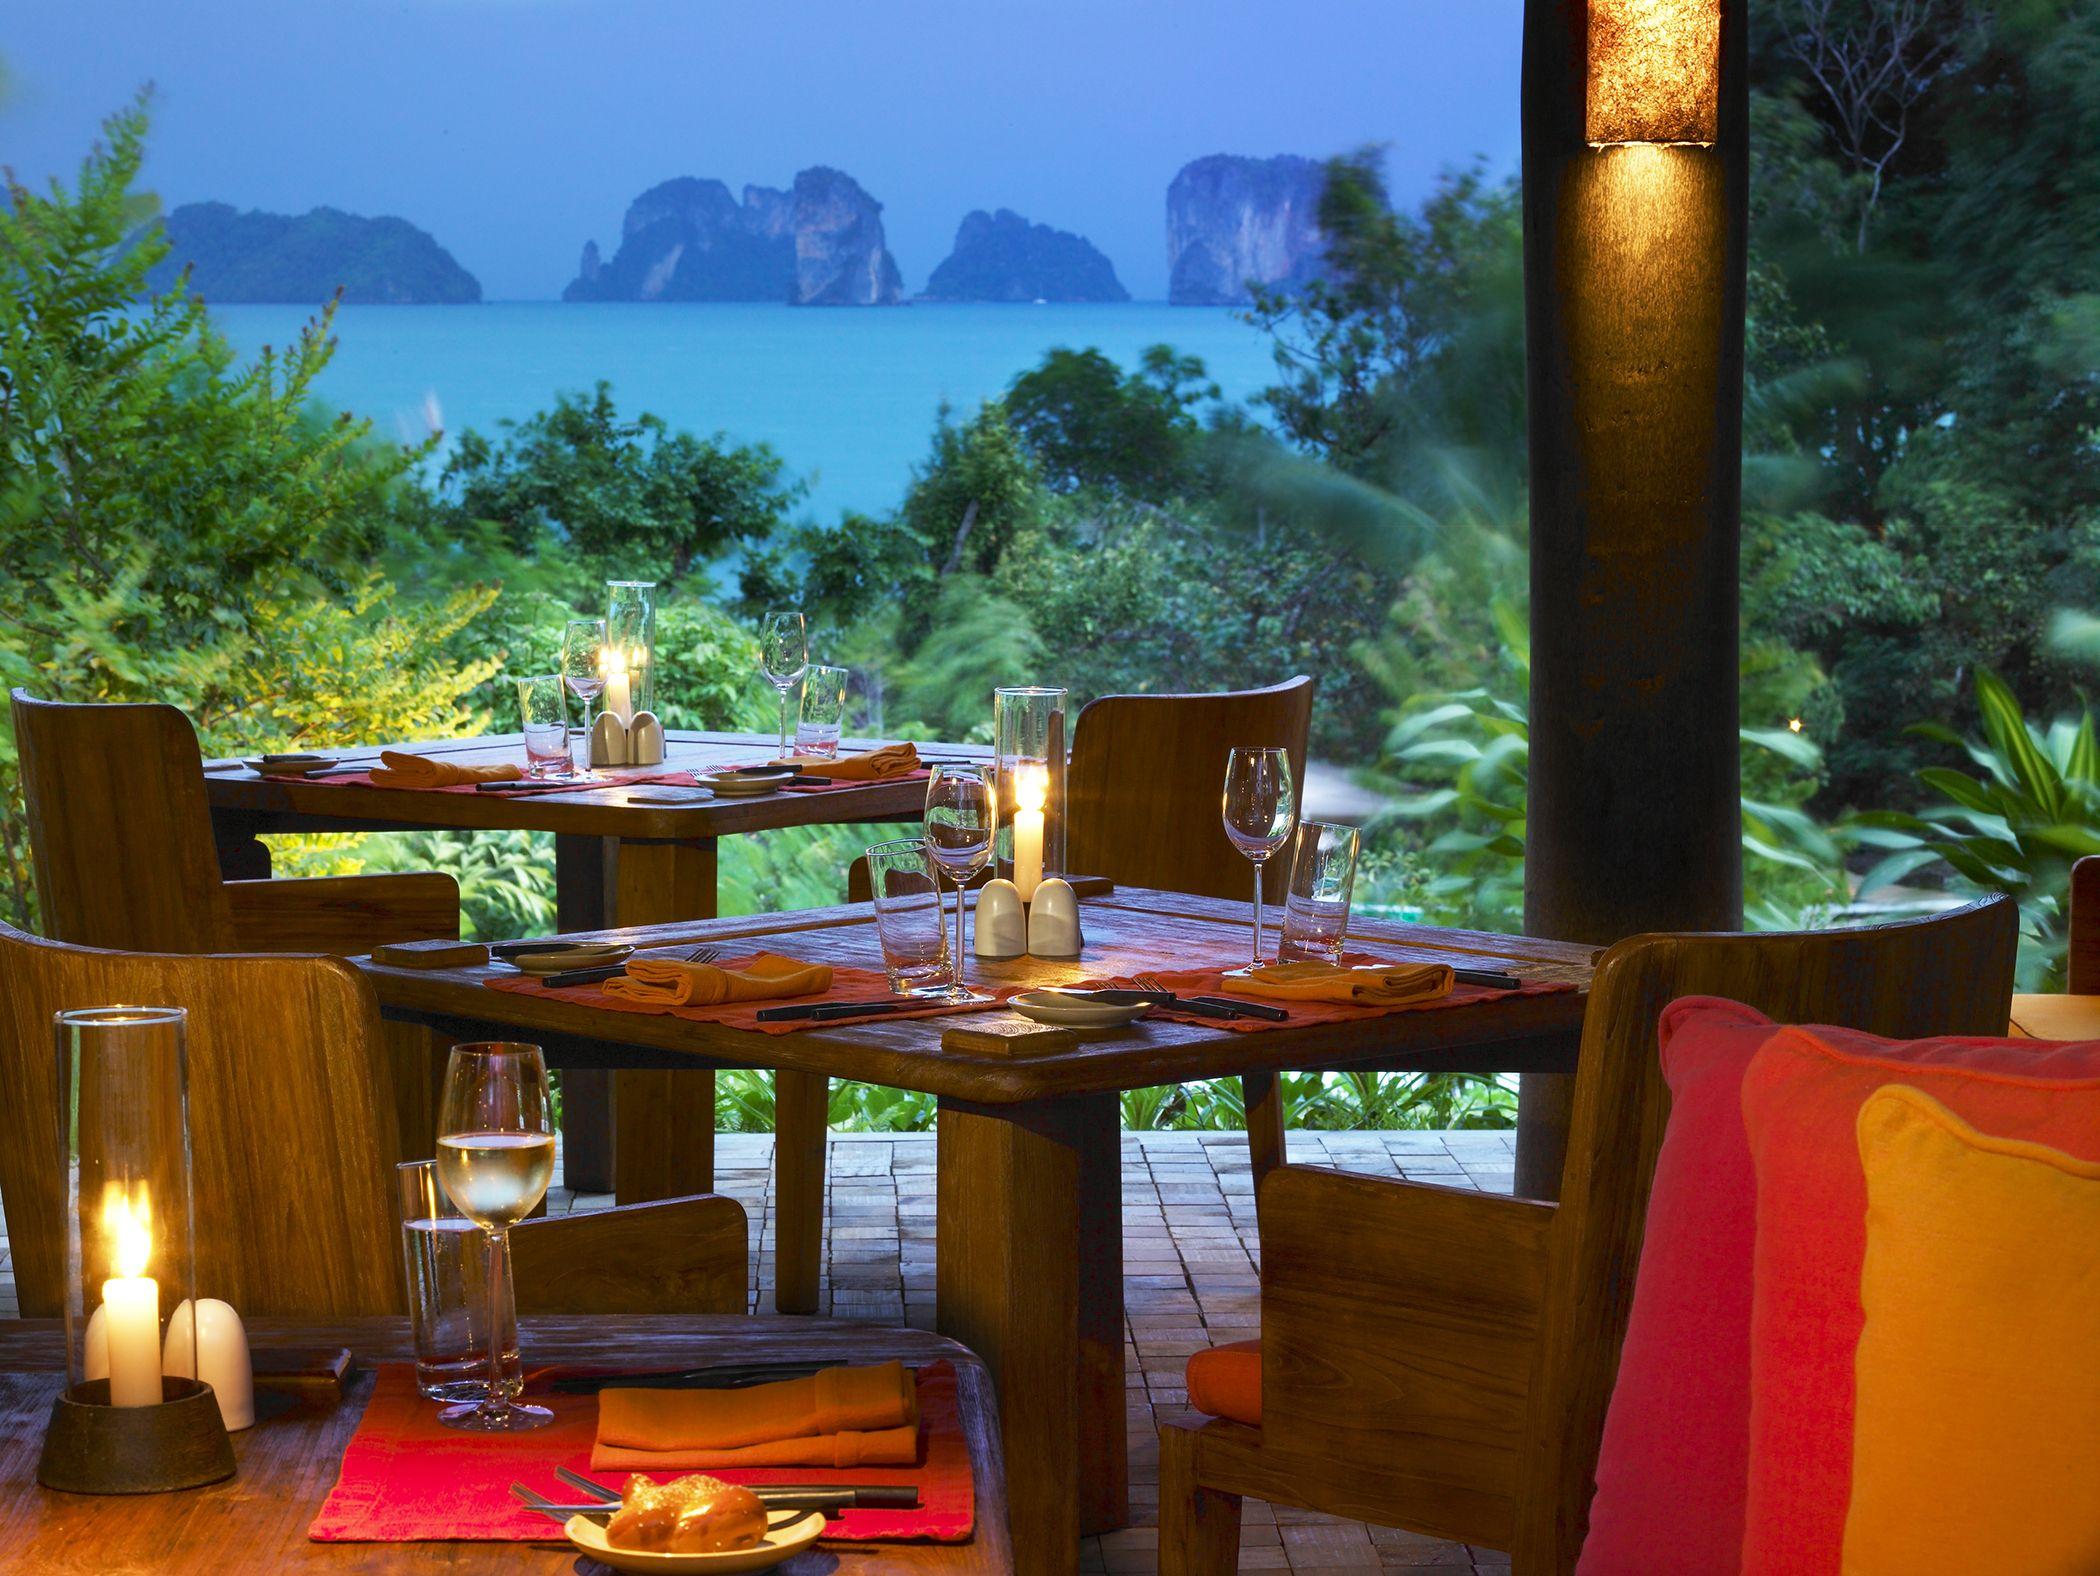 Six Senses Yao Noi, Thailand: http://www.hotelsthatinspire.com/asia/thailand/six-senses-yao-noi